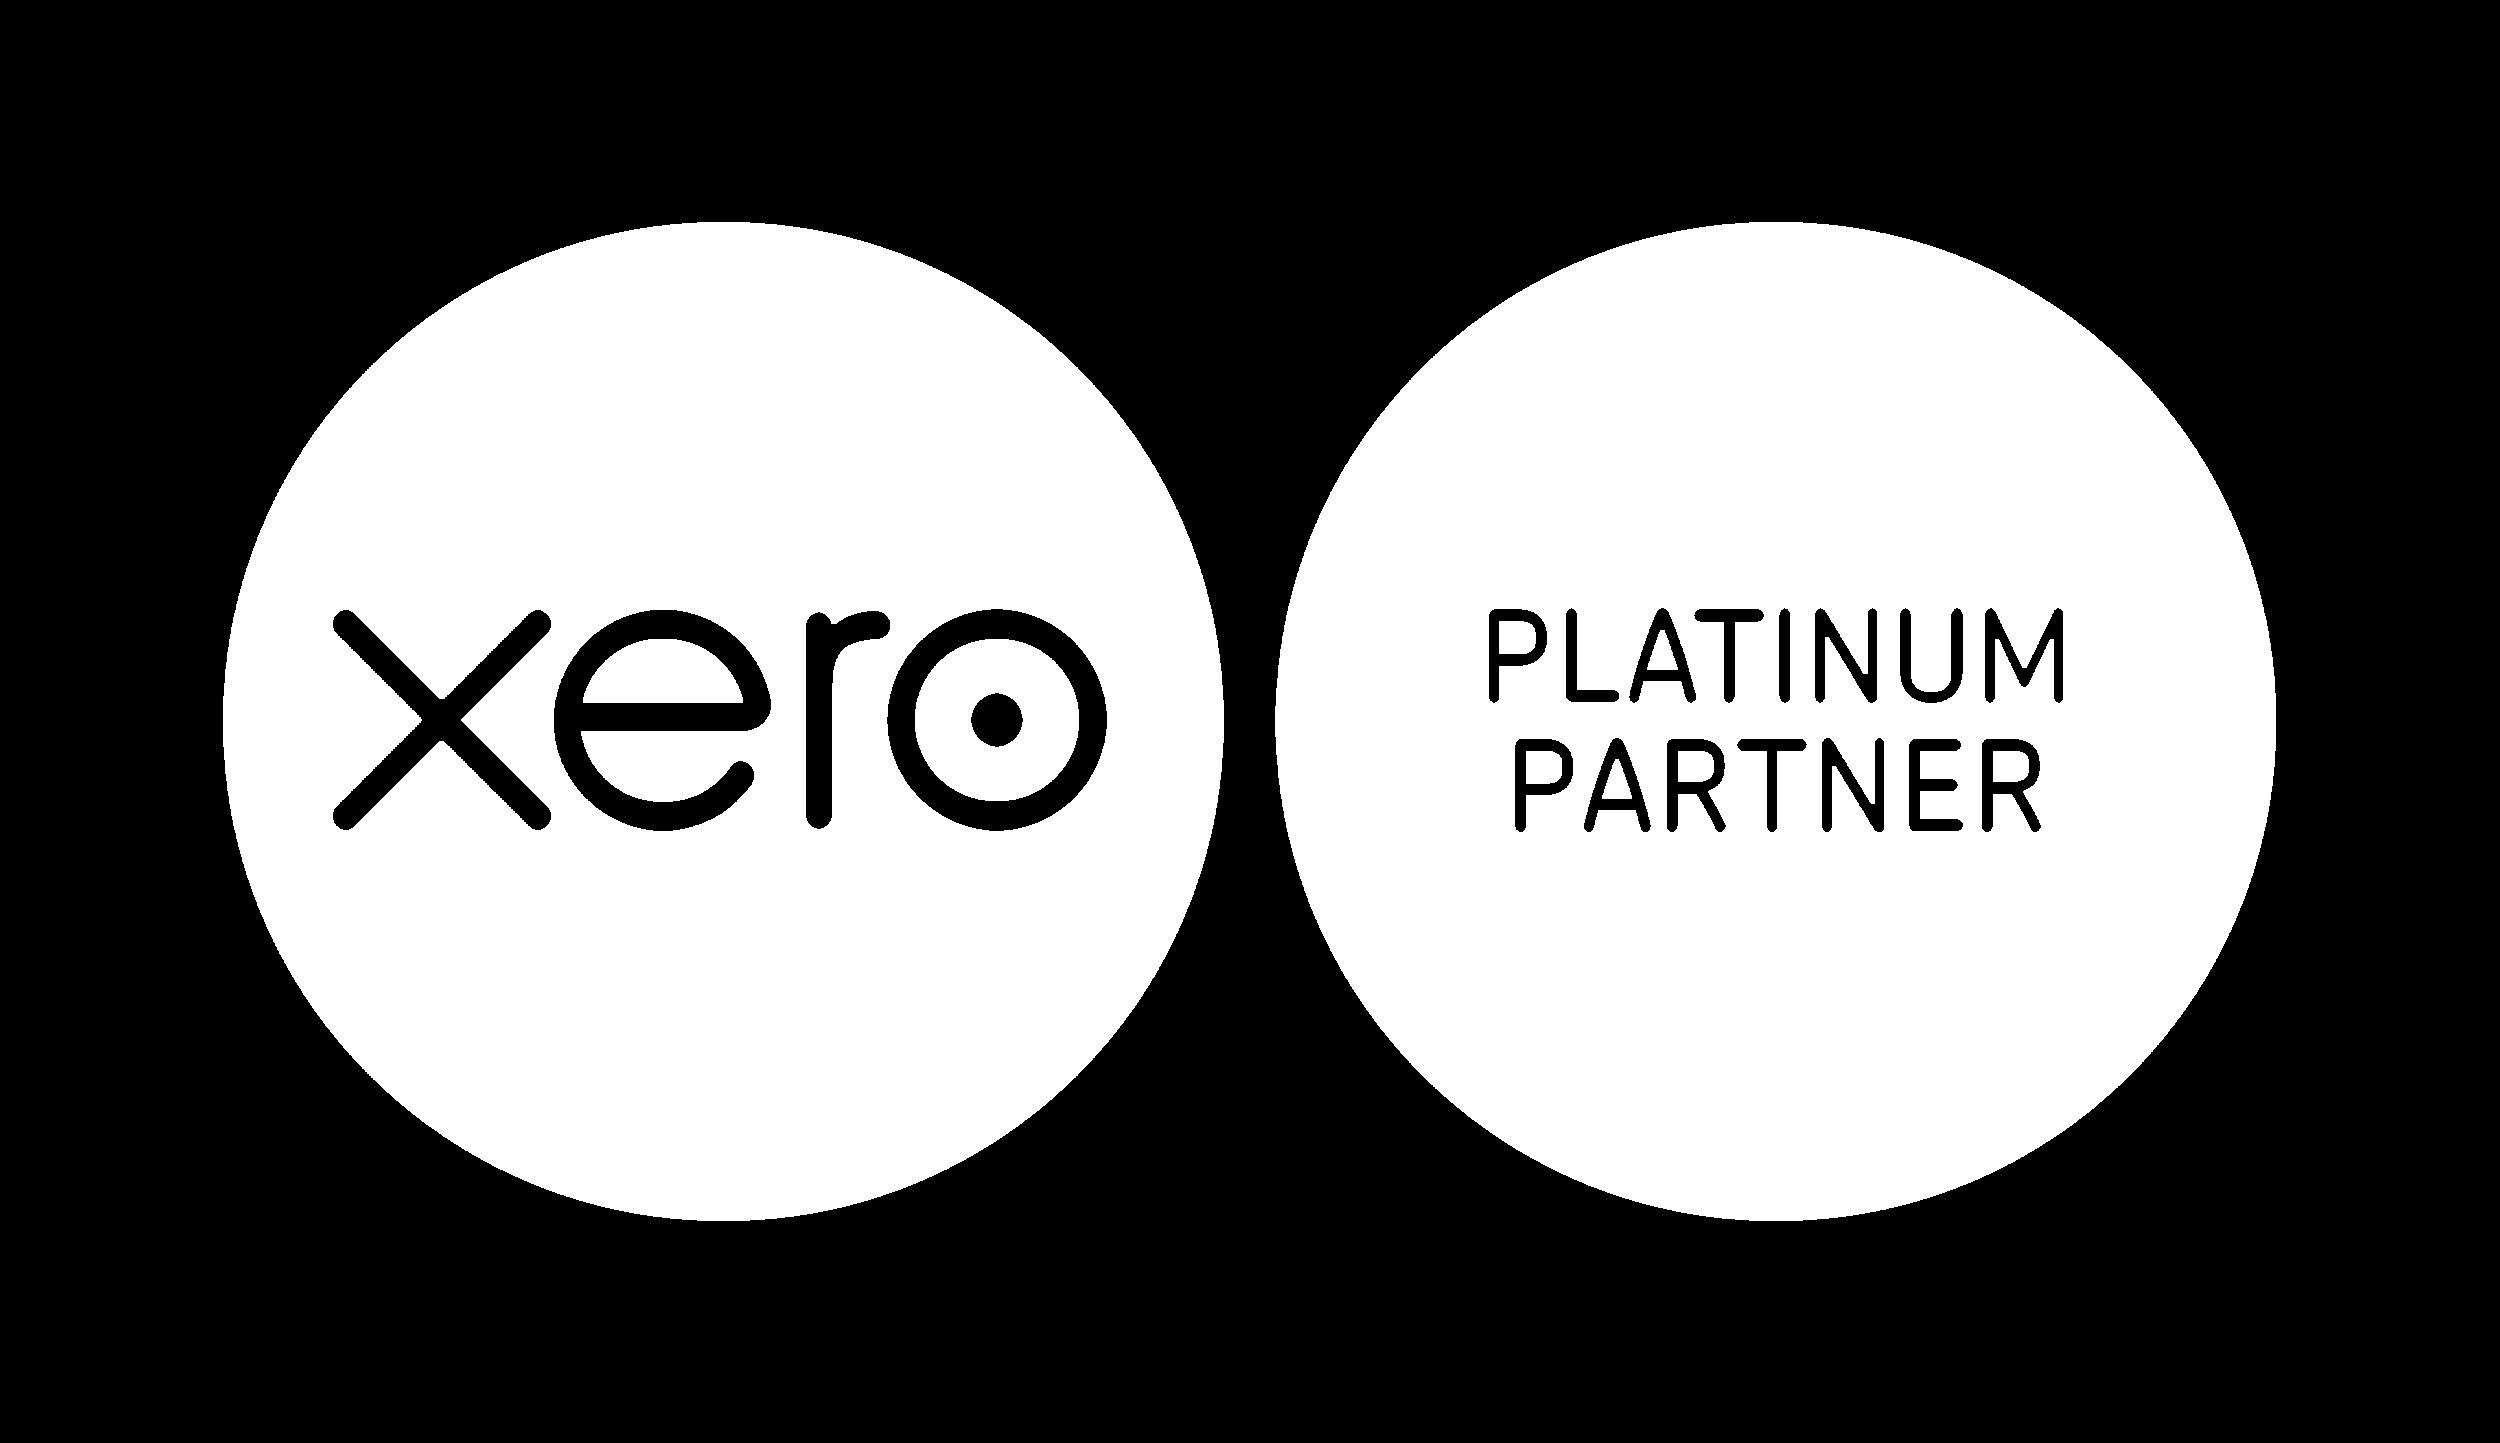 xero-platinum-partner-logo-white.png